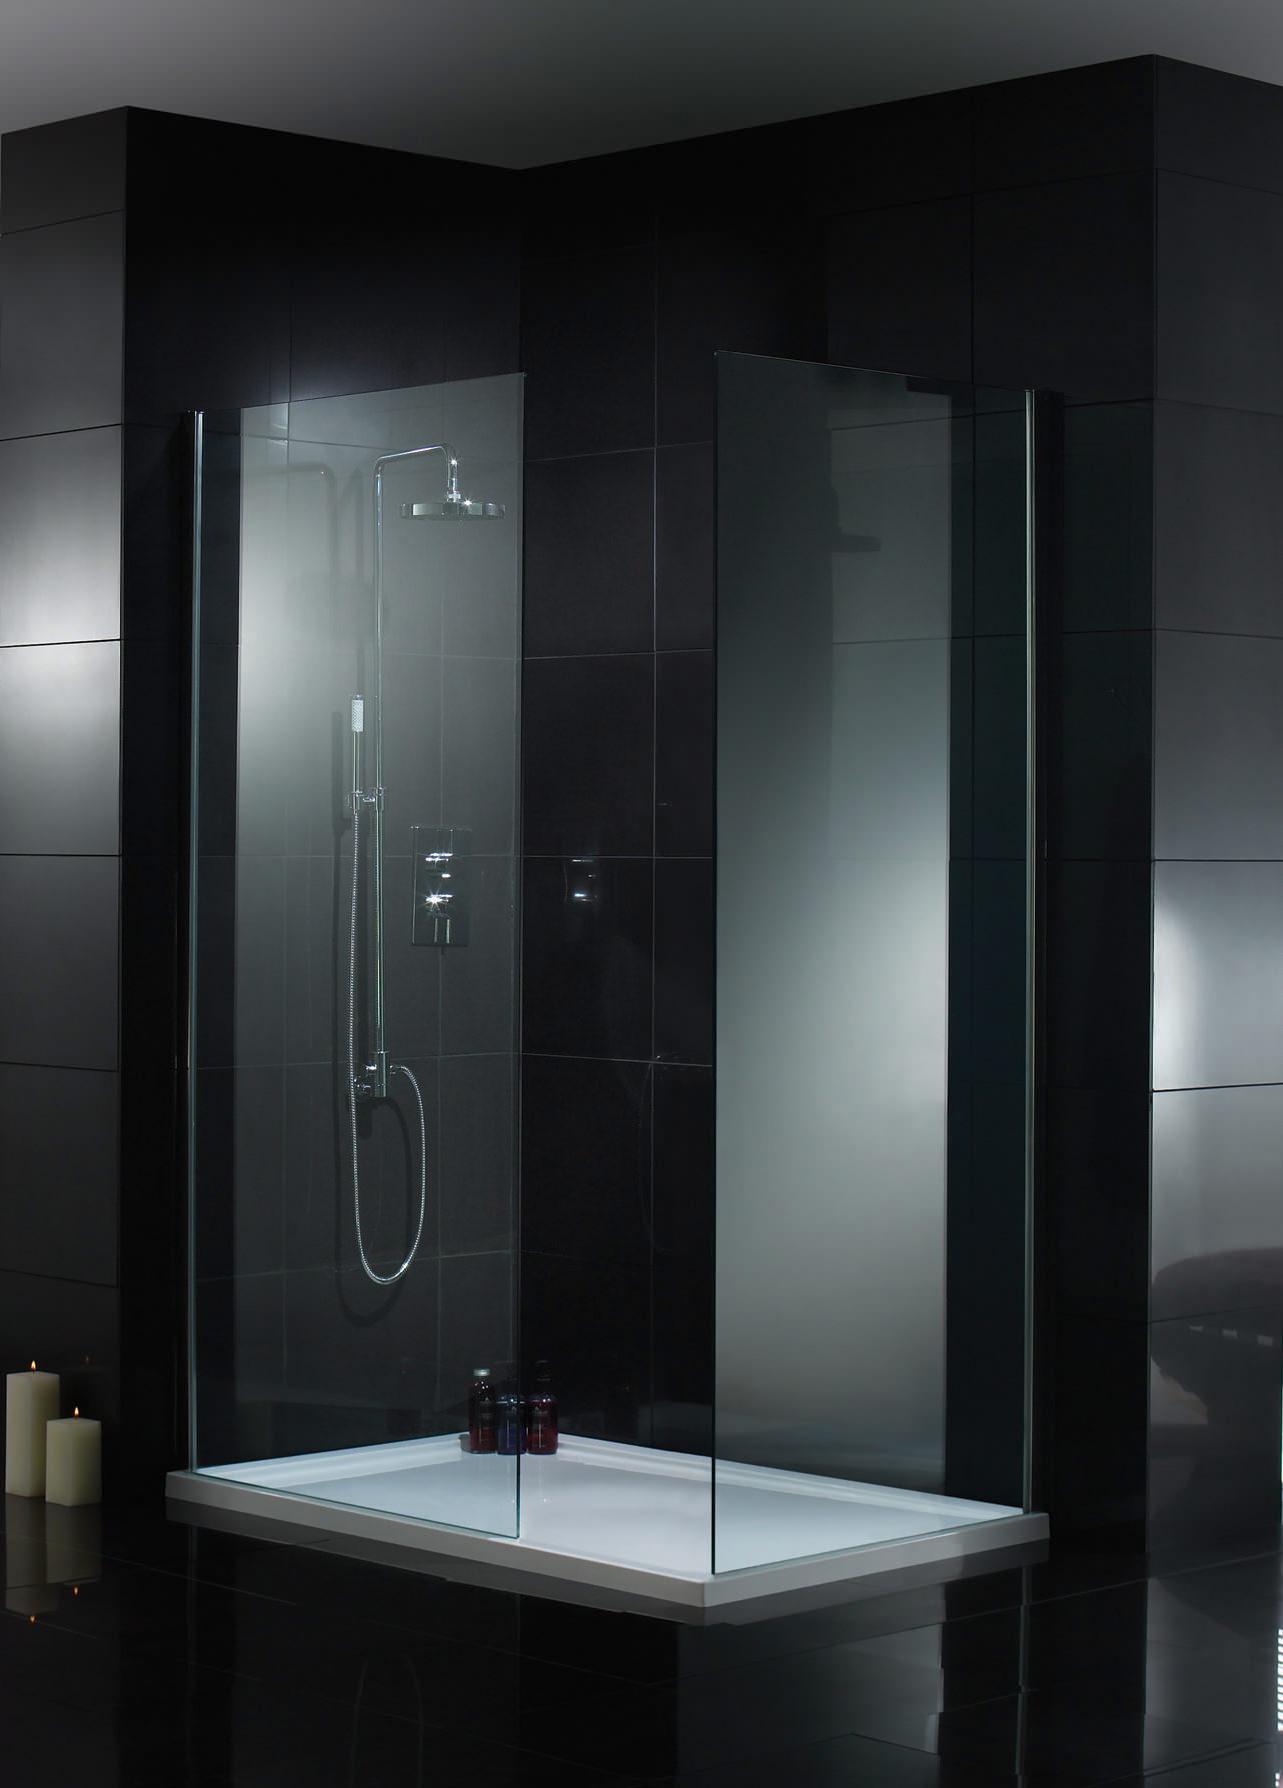 Aquadart wetroom walk in shower glass panel 1200mm aq2012 Shower glass panel